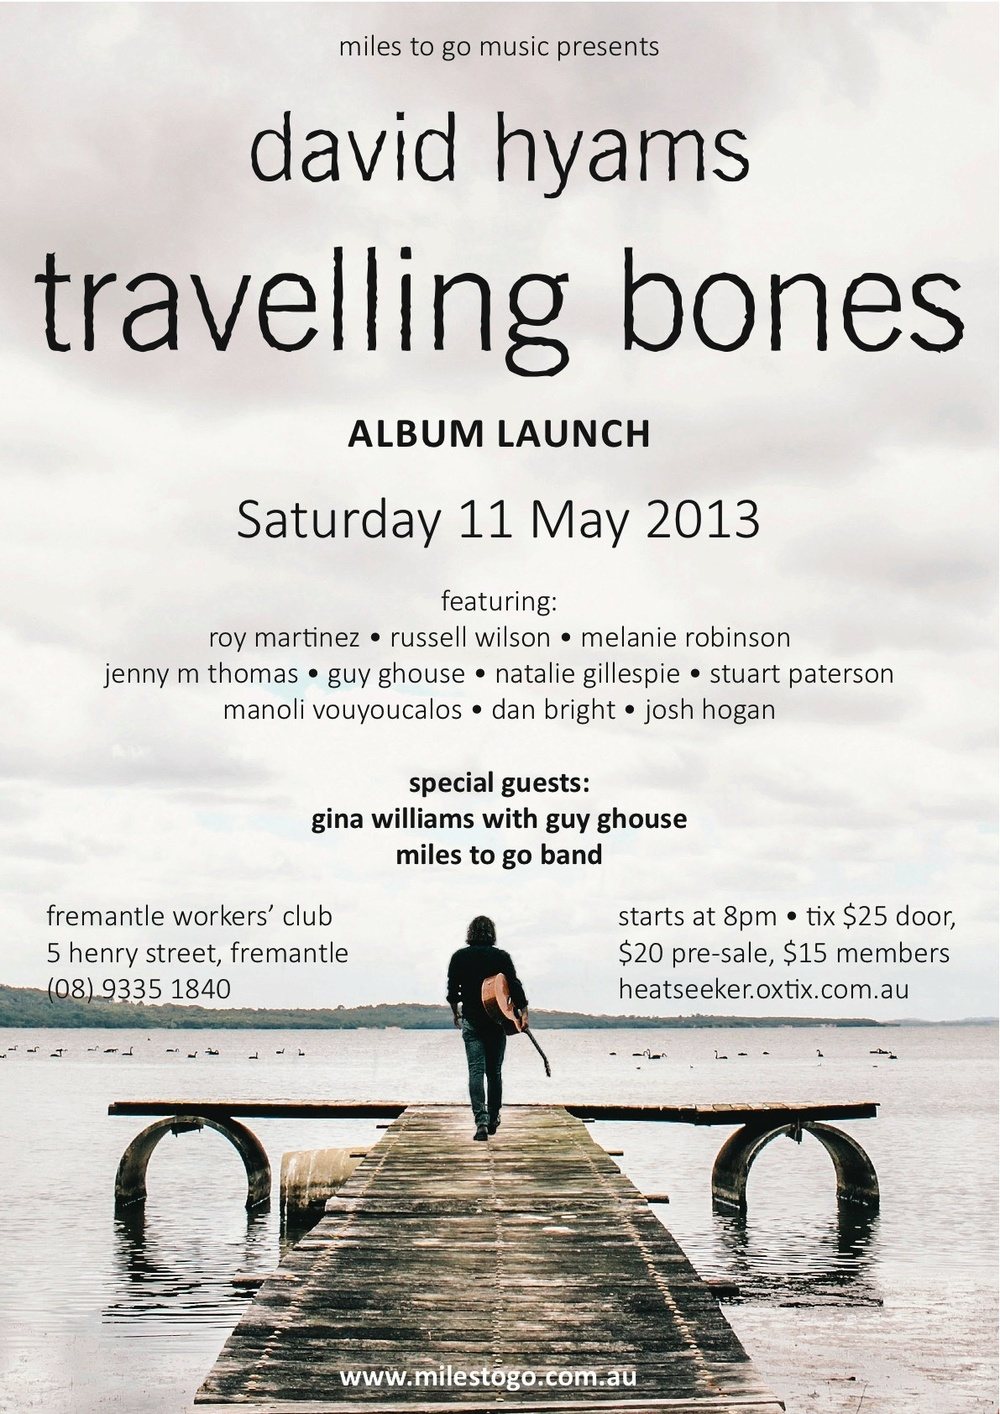 travelling bones launch poster small-1.jpg